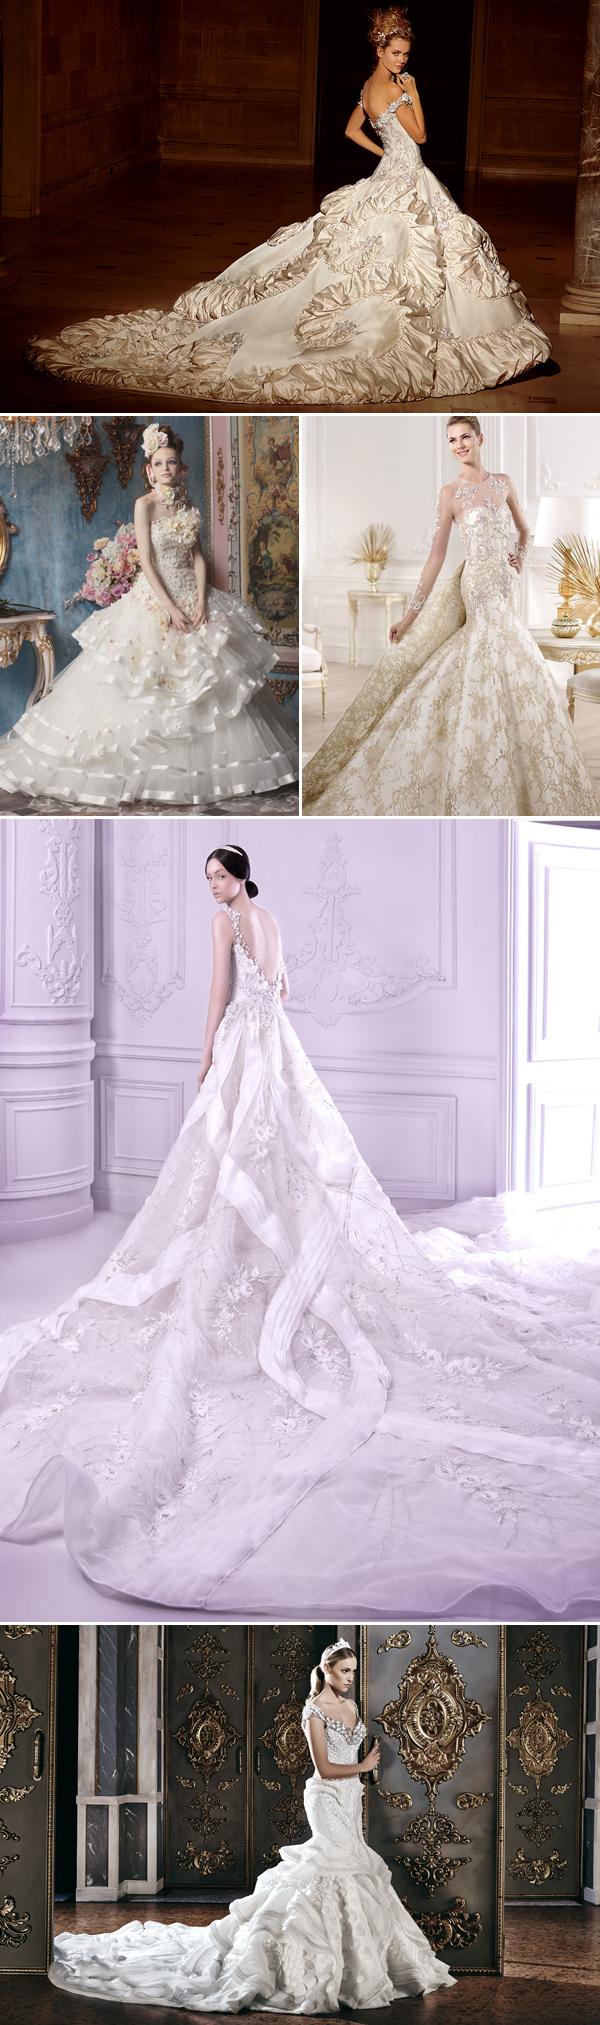 royalgown03-glam